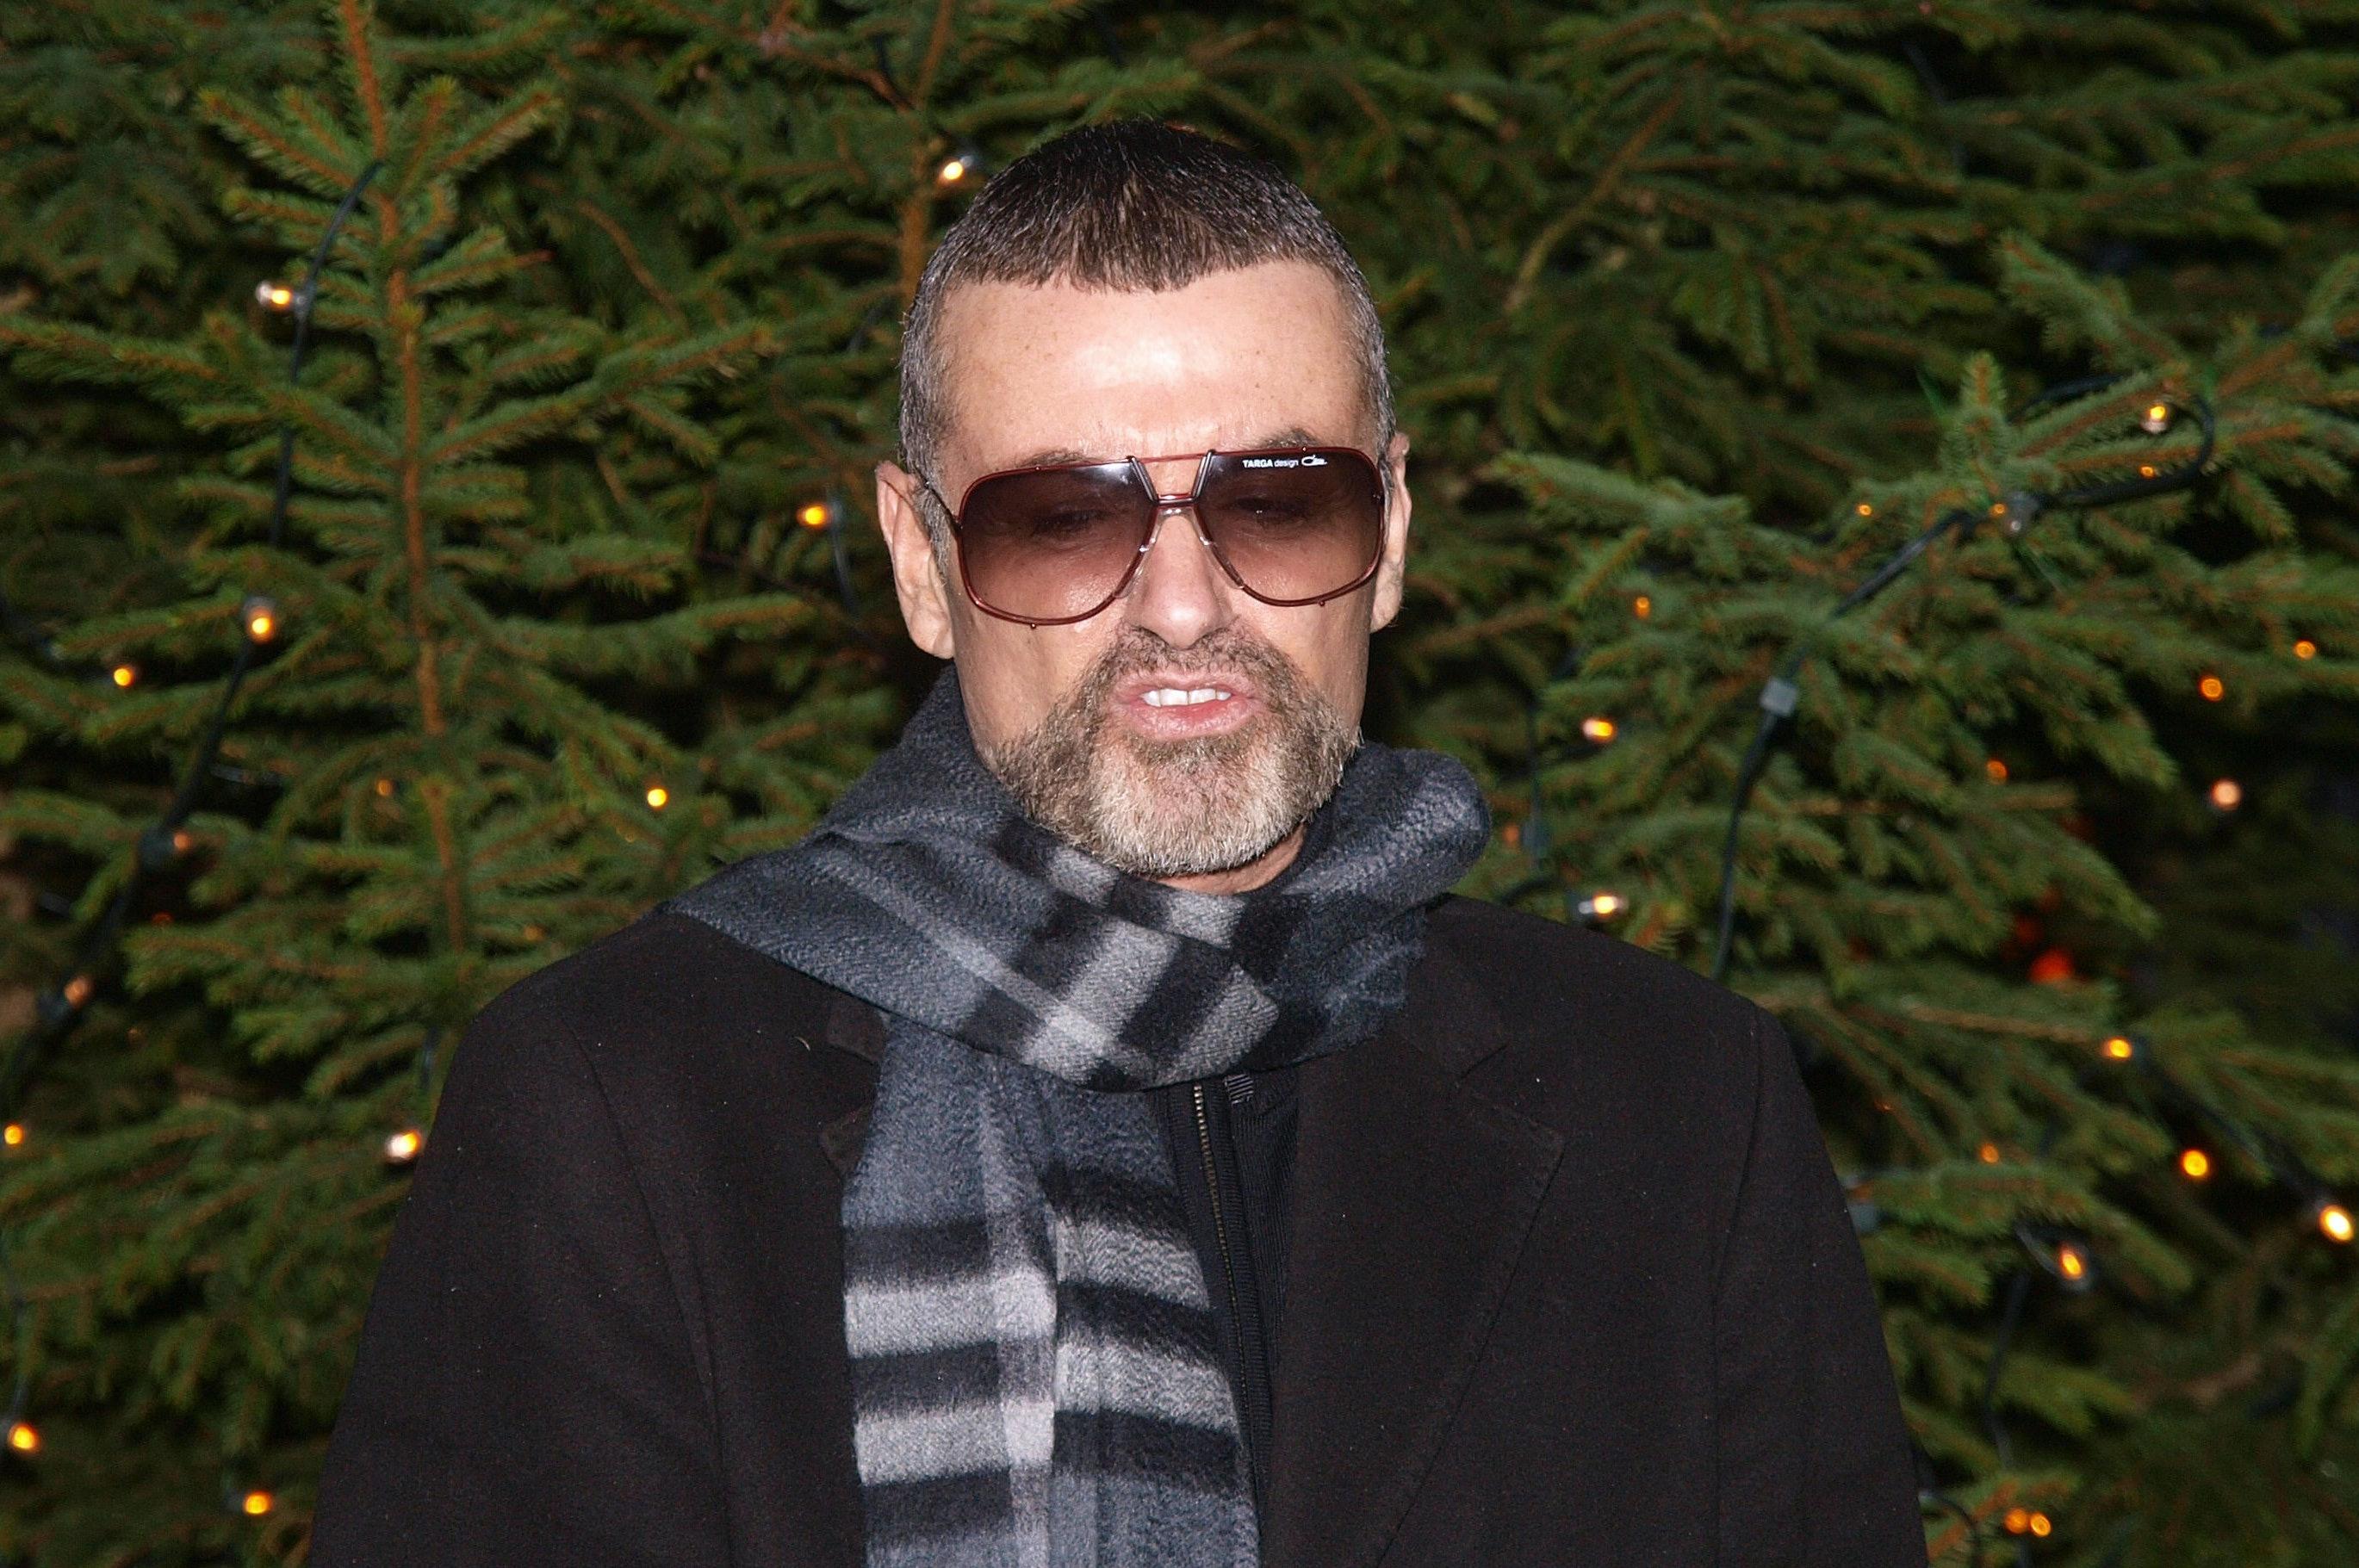 Music superstar George Michael dies aged 53